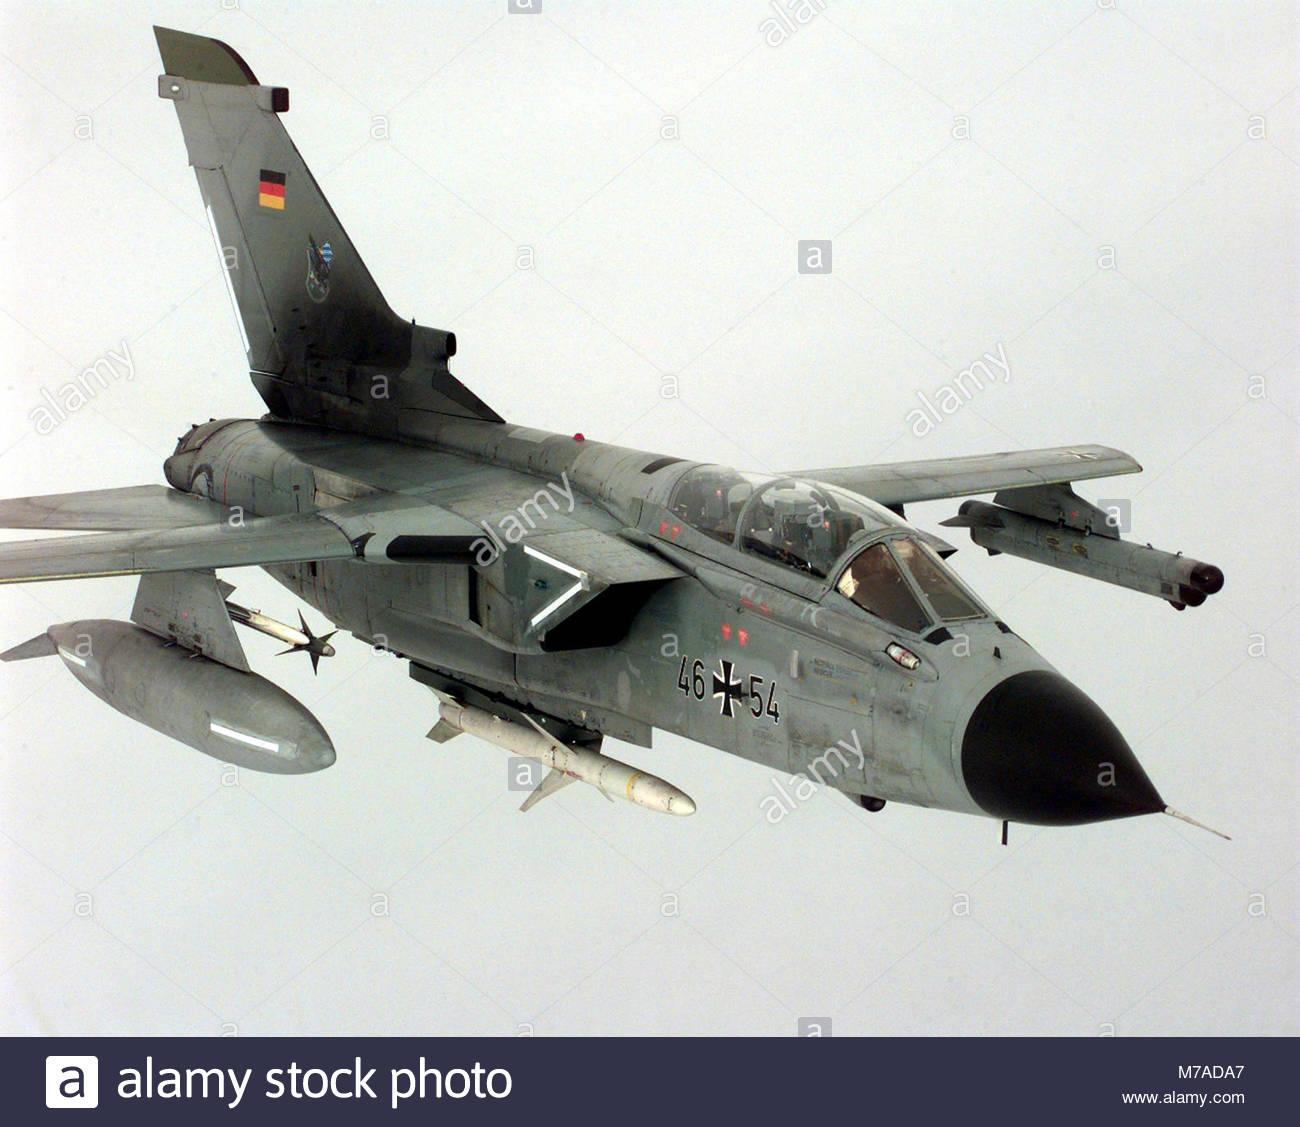 Panavia Tornado. A German Air Force Panavia Tornado of JbG-32, Lechfeld, Germany, with an AIM-9 Sidewinder air-to - Stock Image